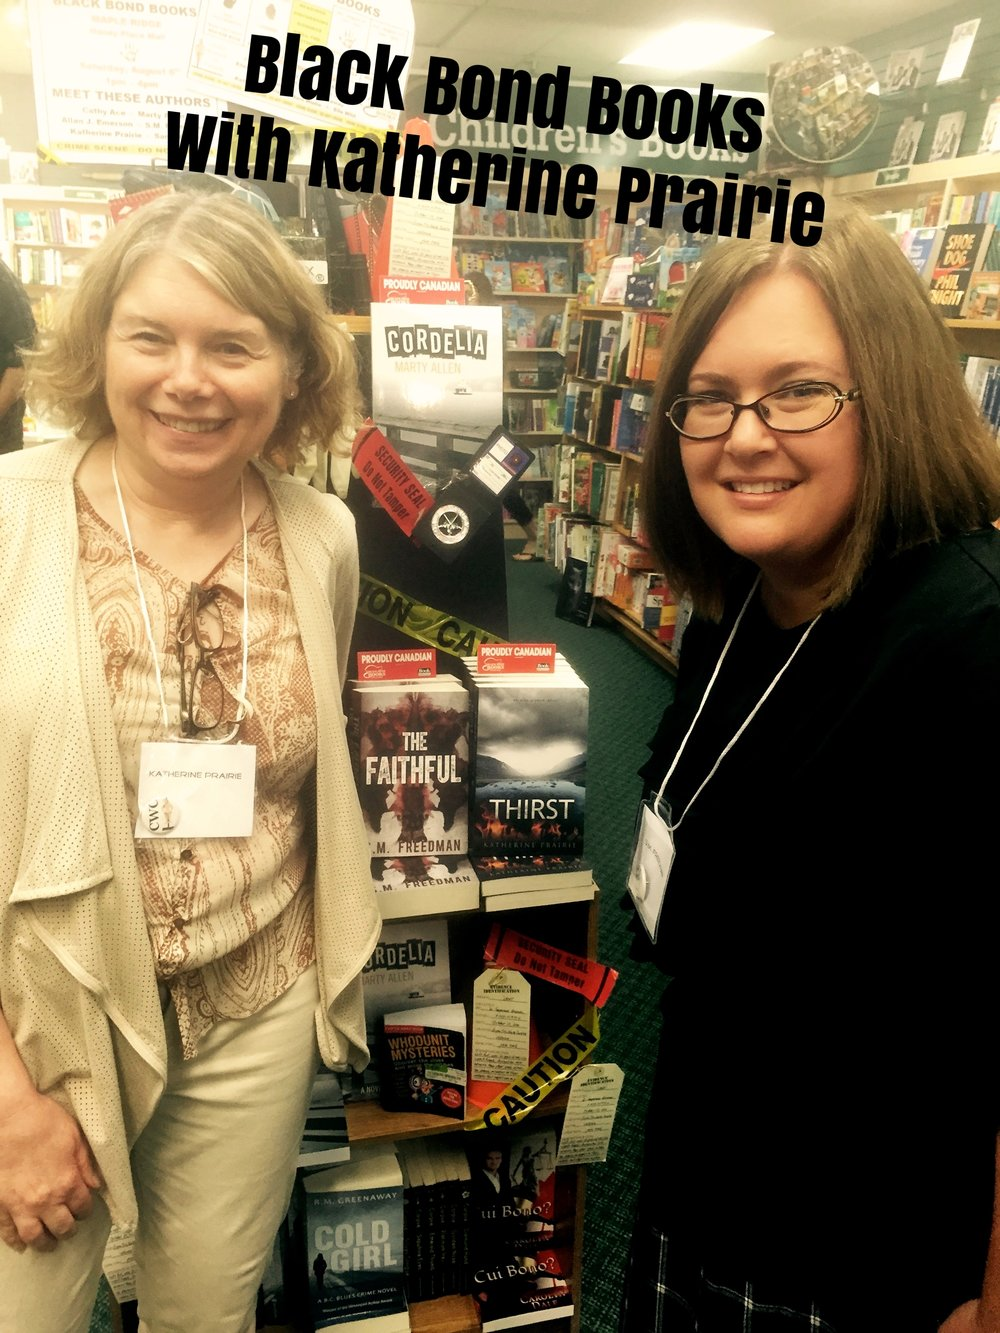 With Katherine Prairie